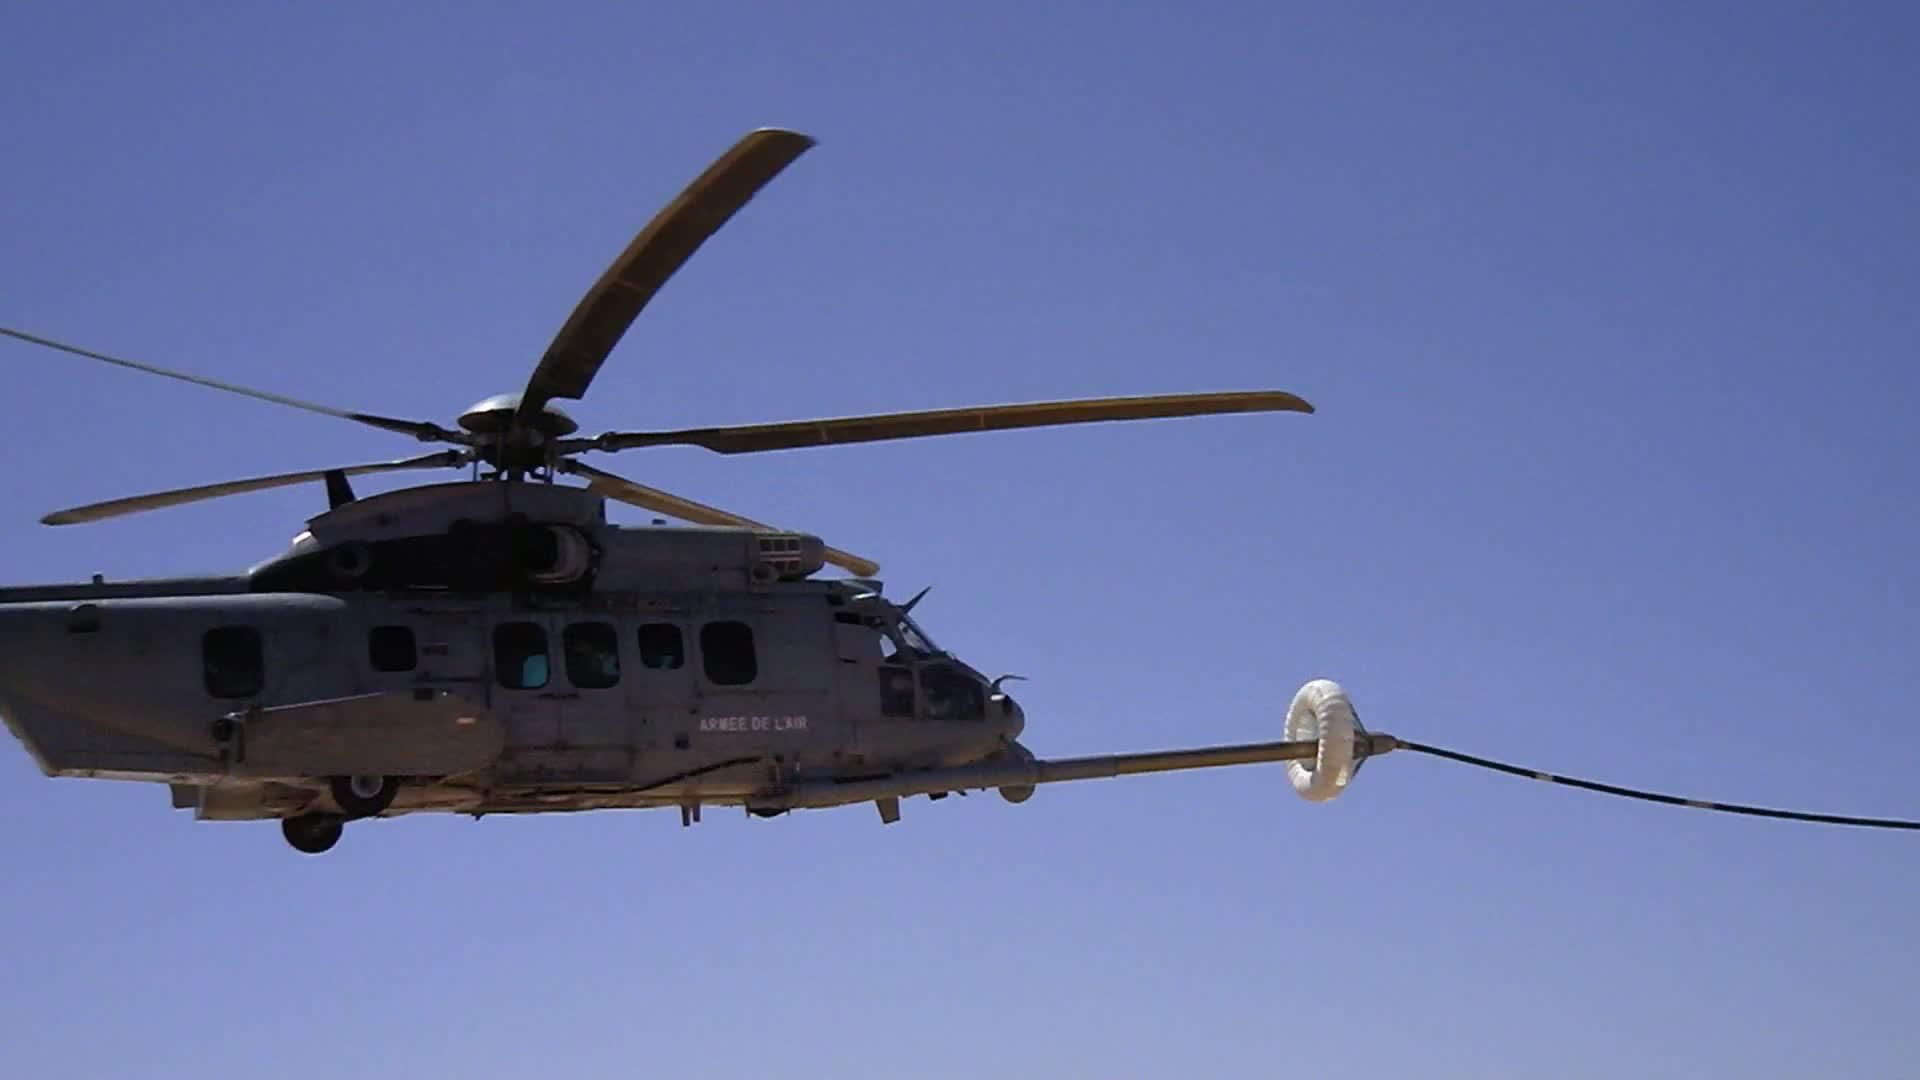 H225M Refueled In Flight